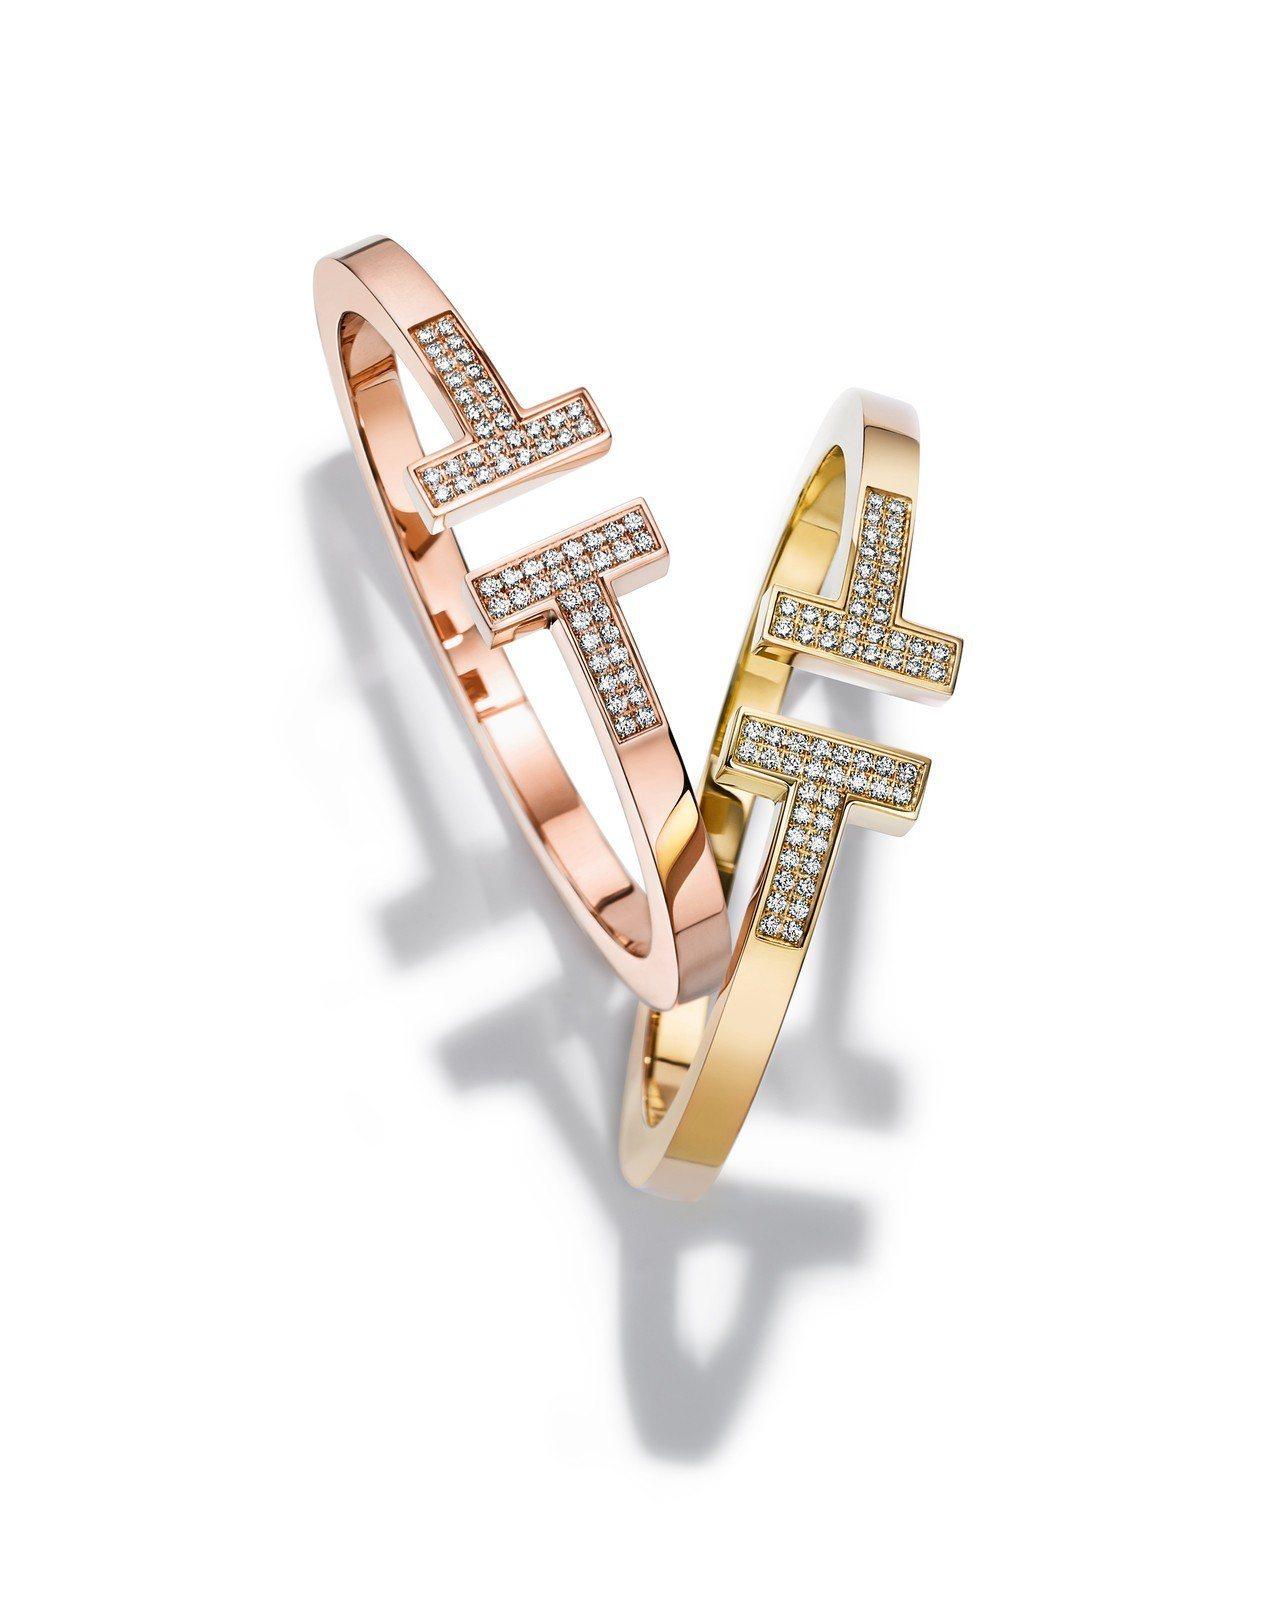 Tiffany T Square 鑲鑽石手環,約42萬4,000元。圖/Tiff...